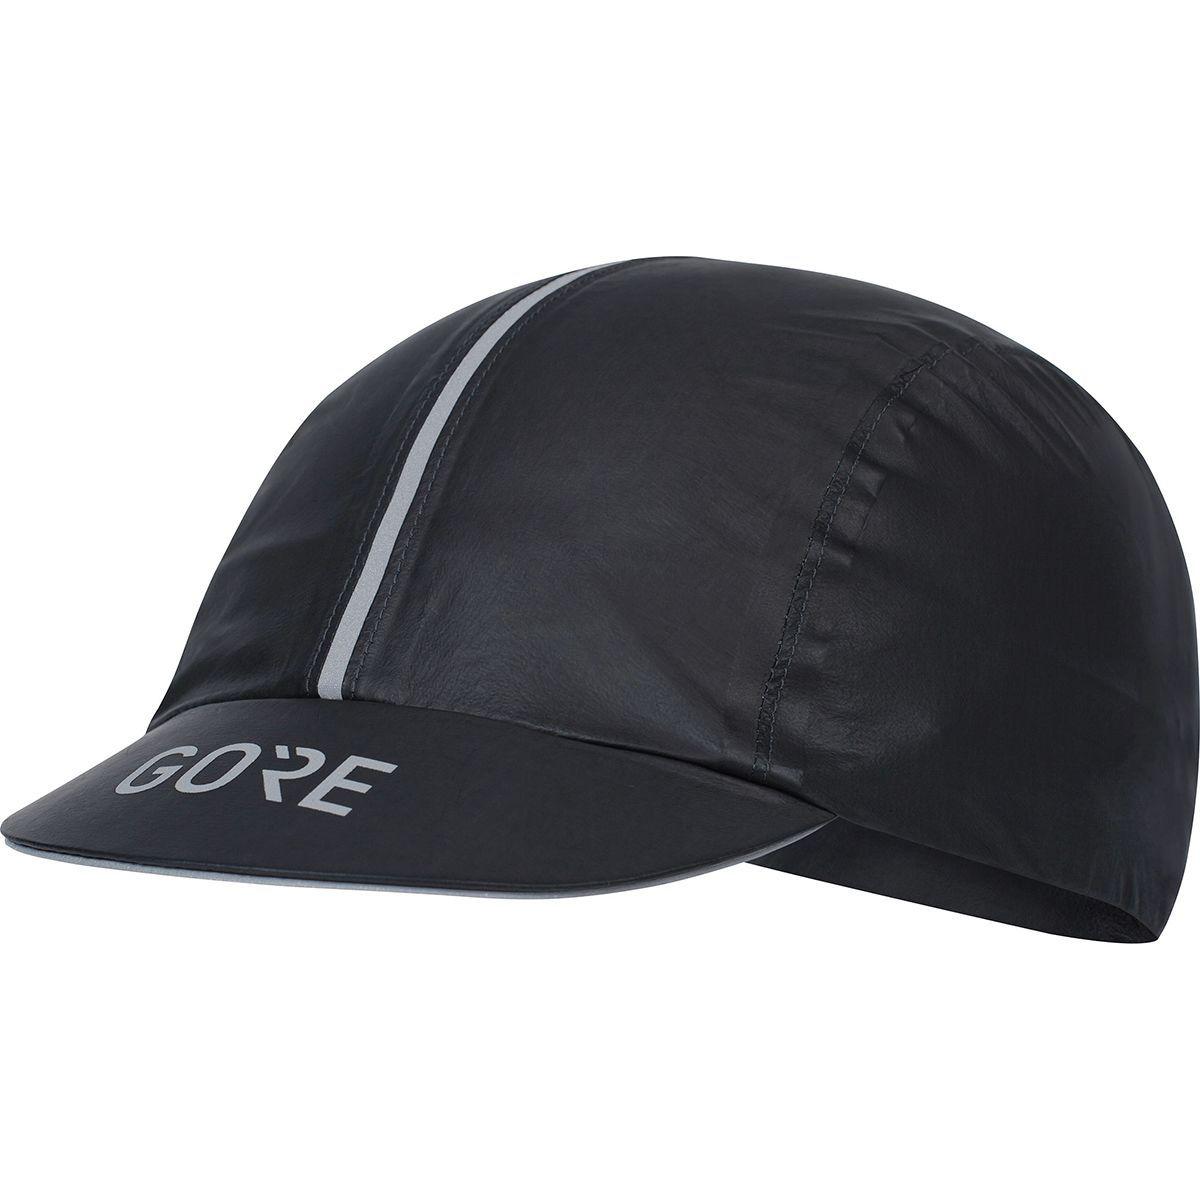 Sports Cap Hat Bike Cycling Black White Men Women Team Polyester Wear Gift Ideas